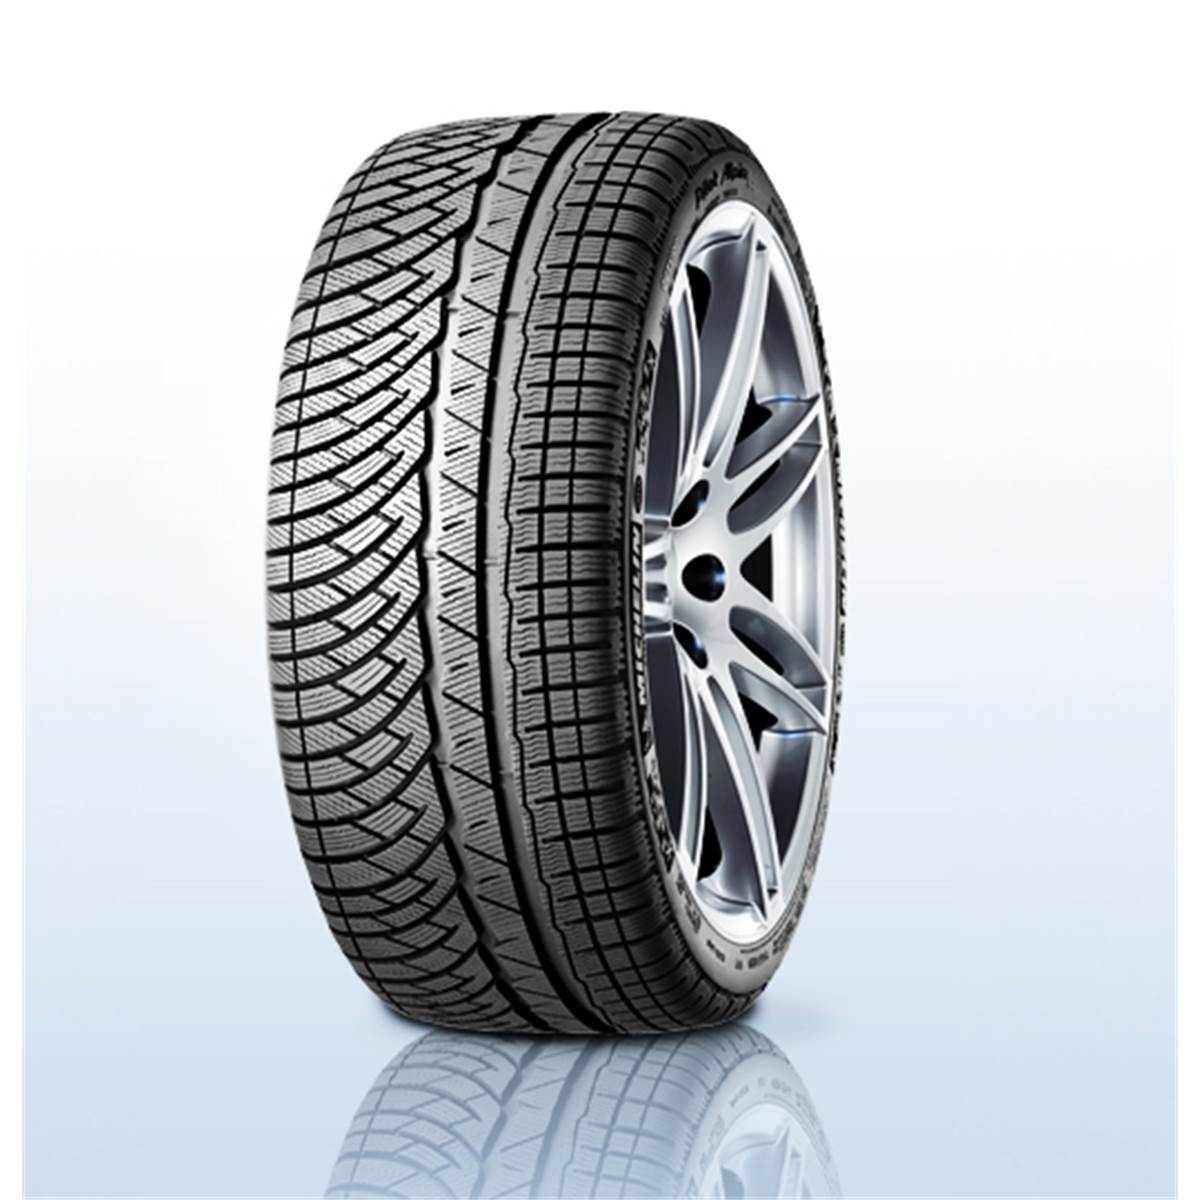 Pneu Hiver Michelin 245/30R21 91W Pilot Alpin Pa4 XL